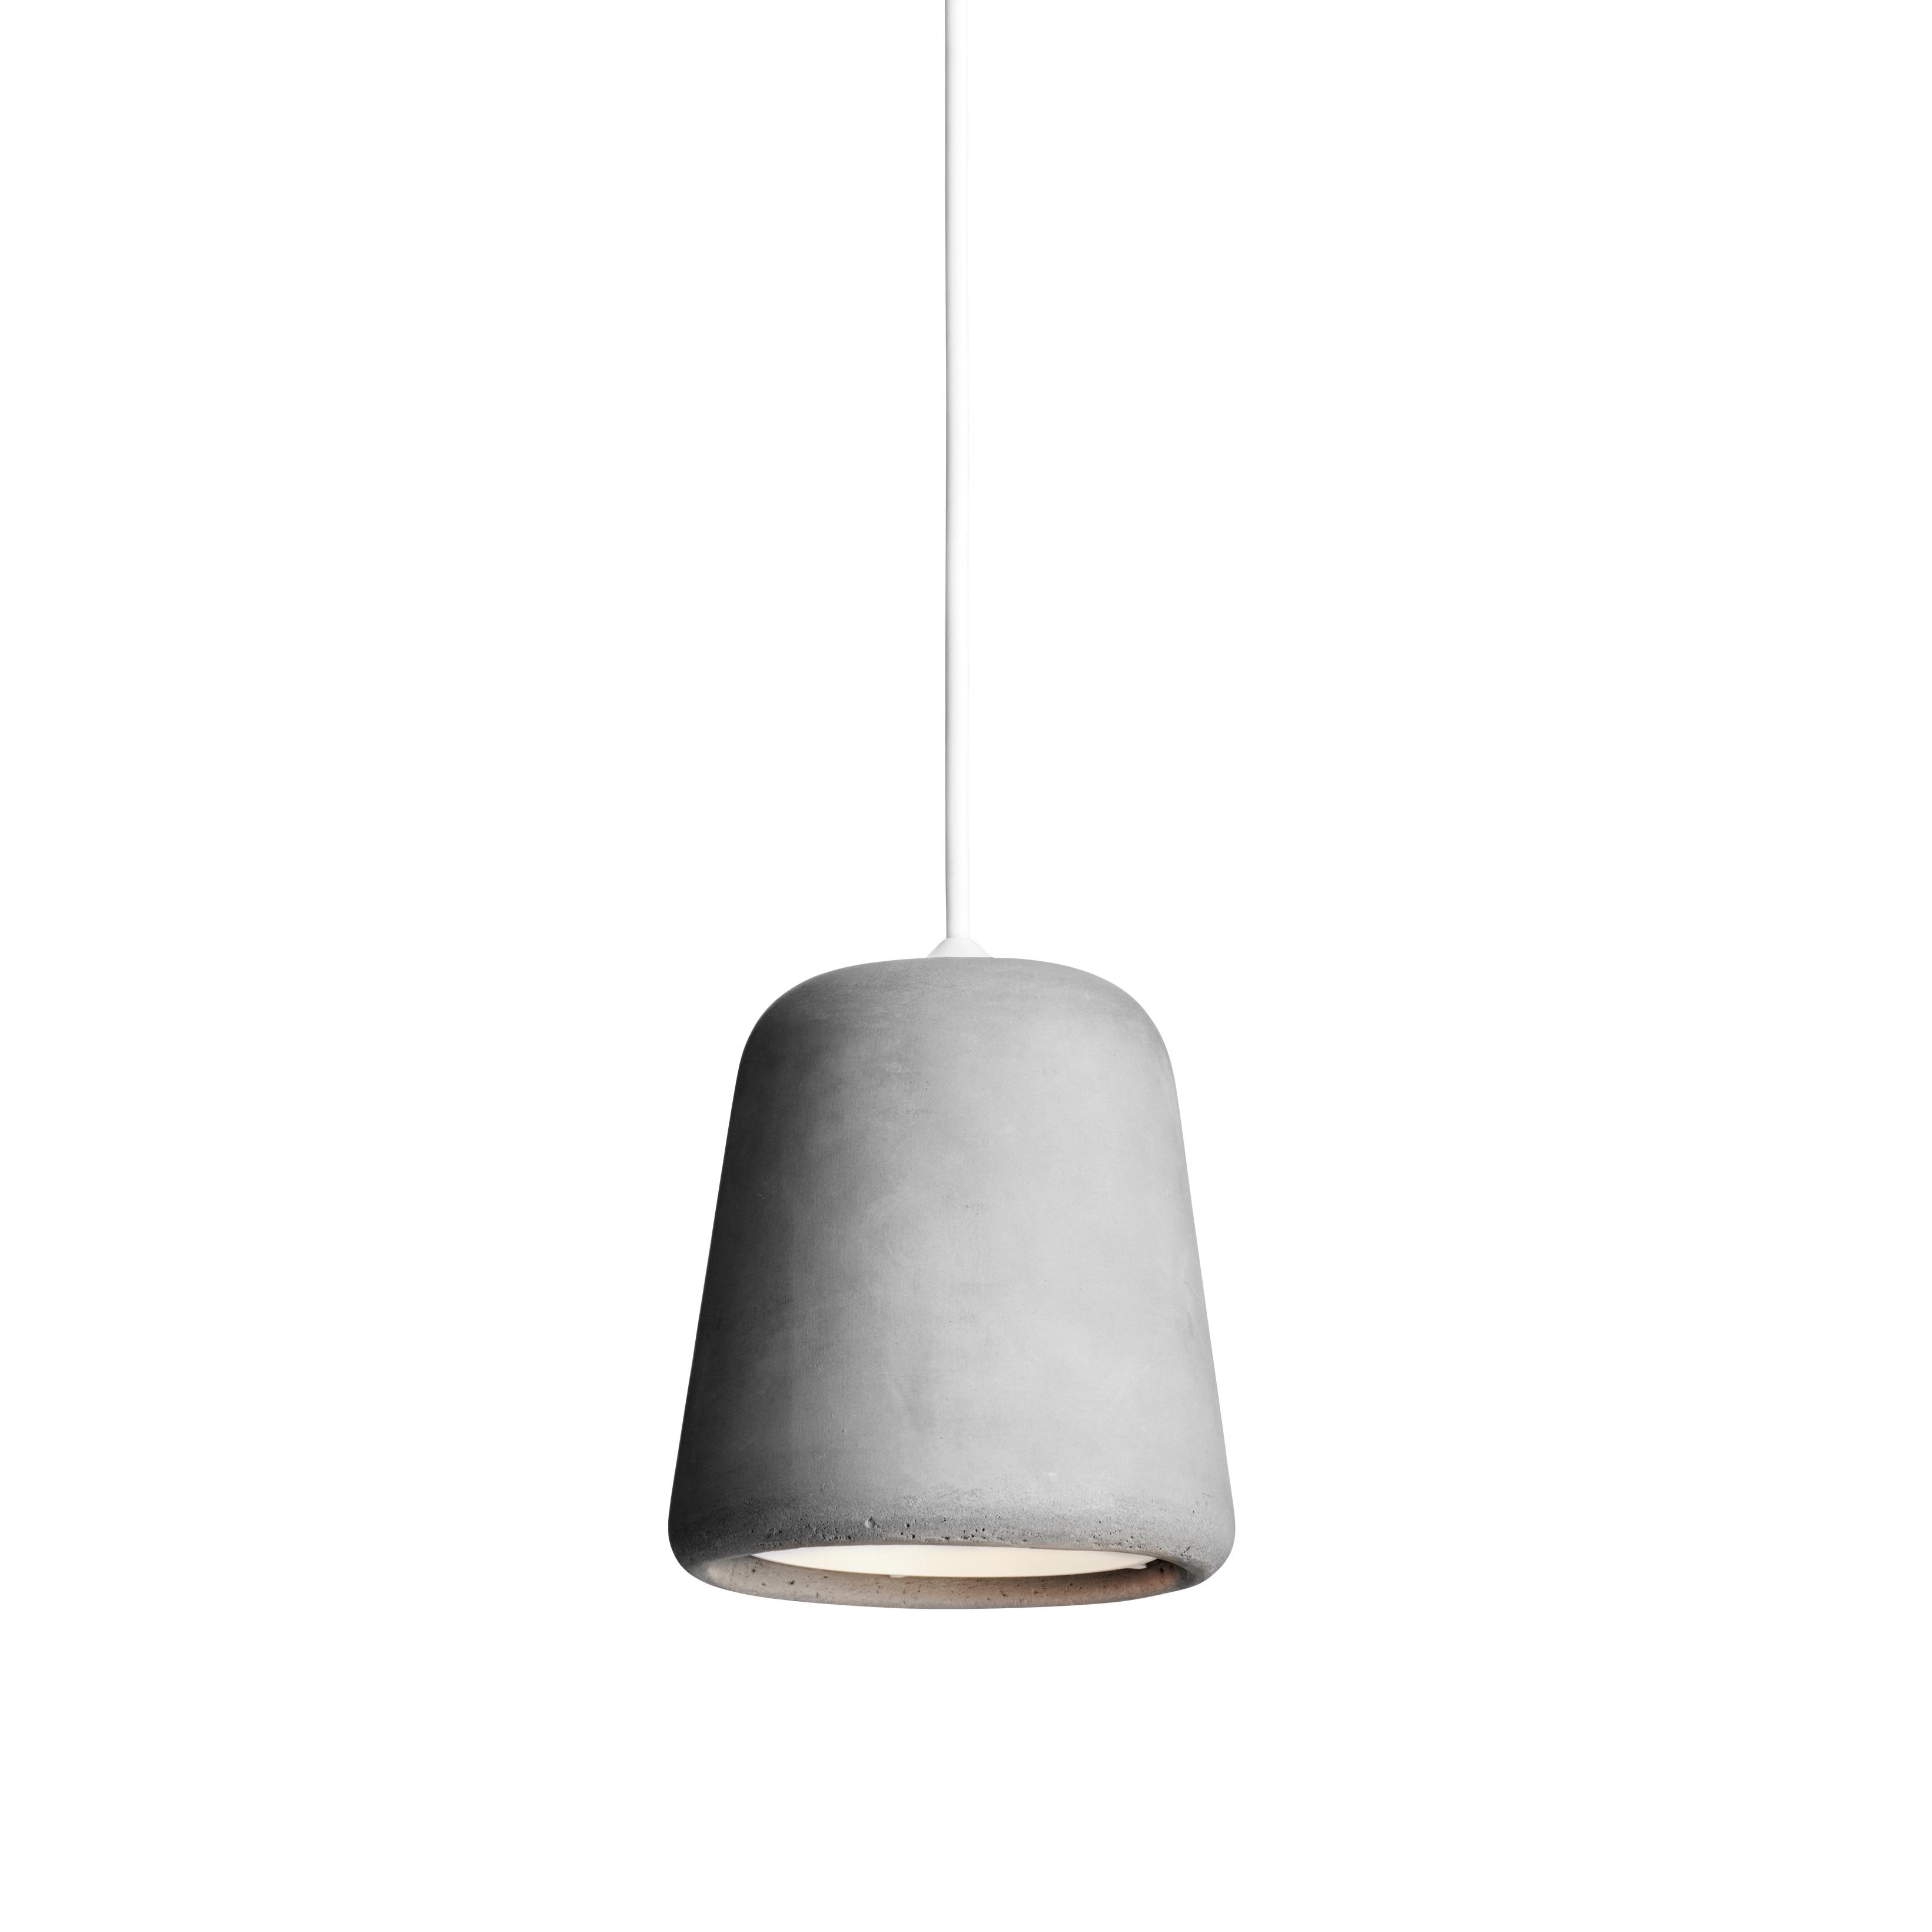 Material taklampa ljusgrå betong/vit